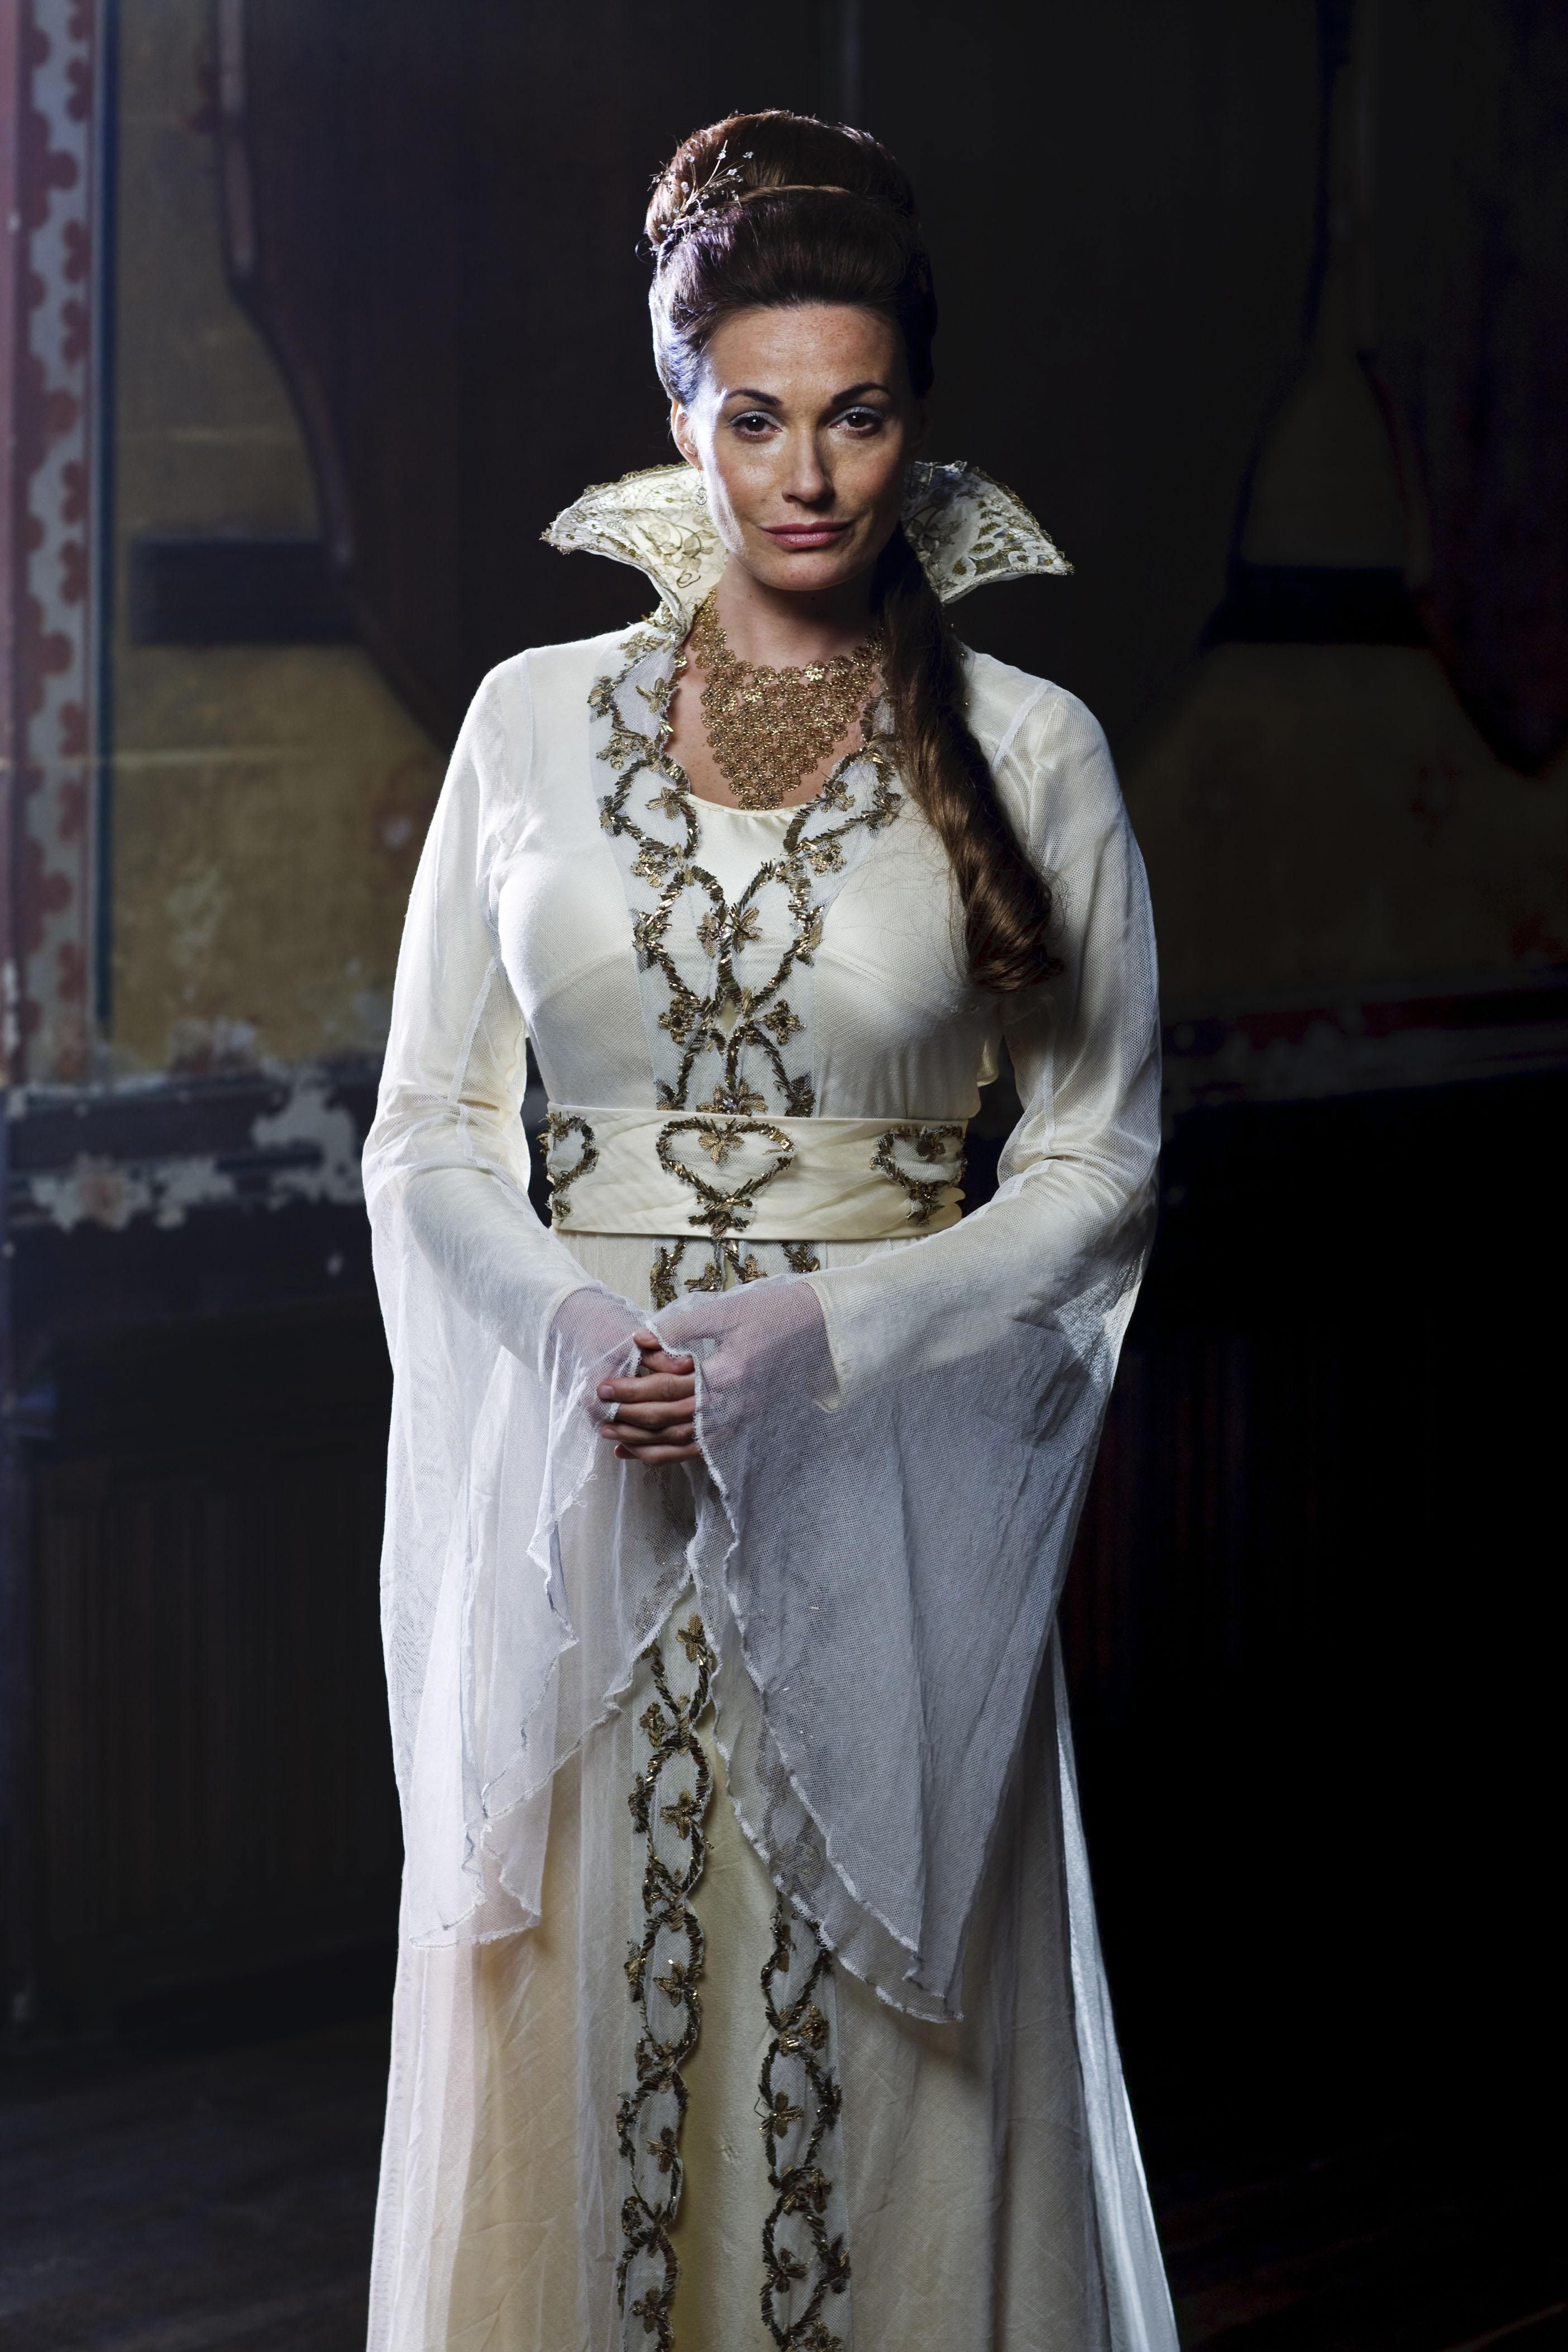 Lady Catrina (wedding dress)